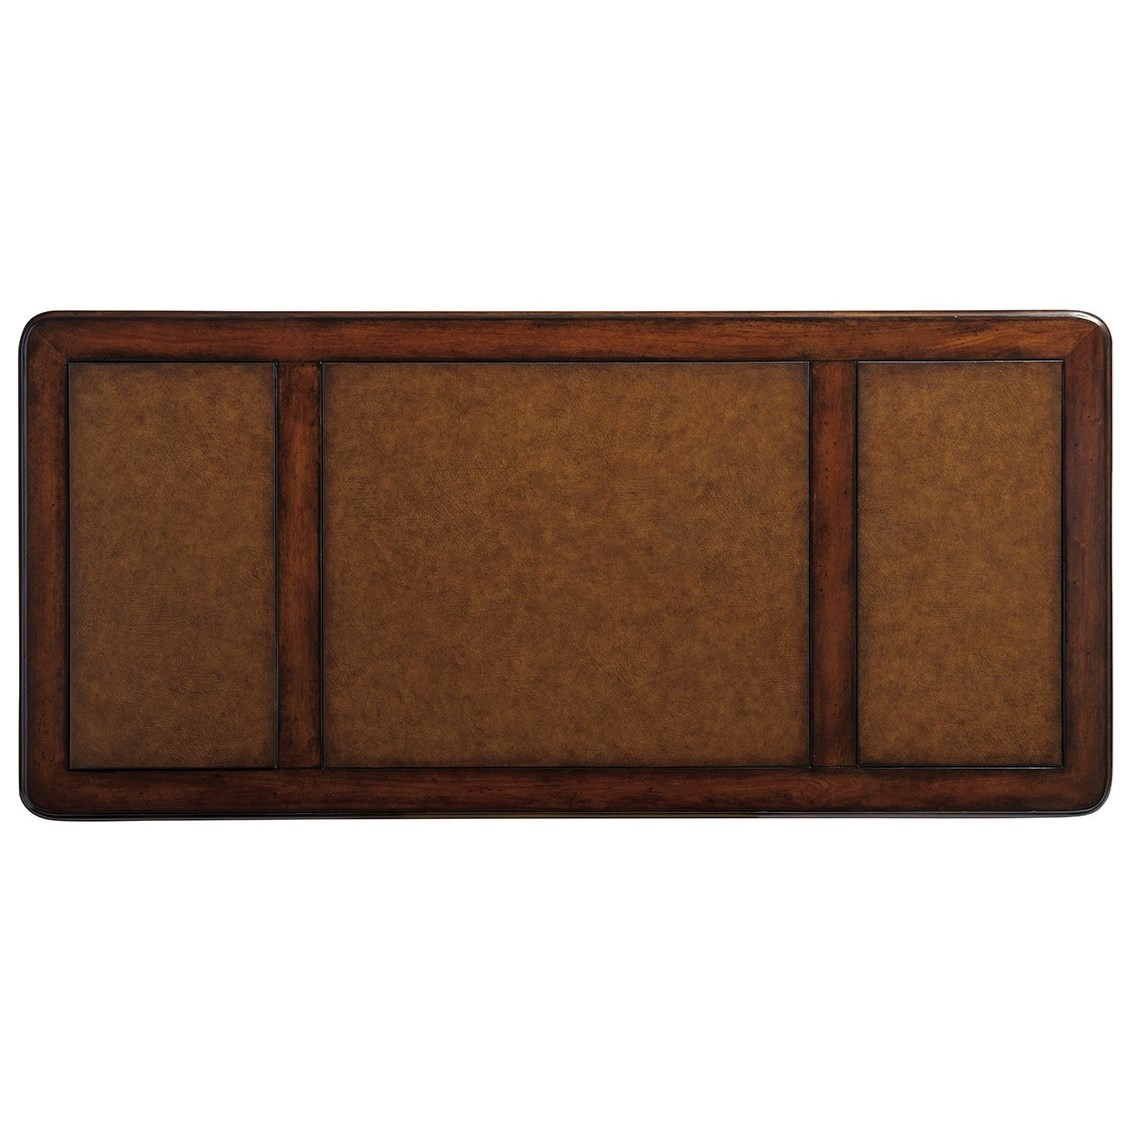 leather sofa richmond hill puff foam sligh 305 412 rosslyn writing desk with faux